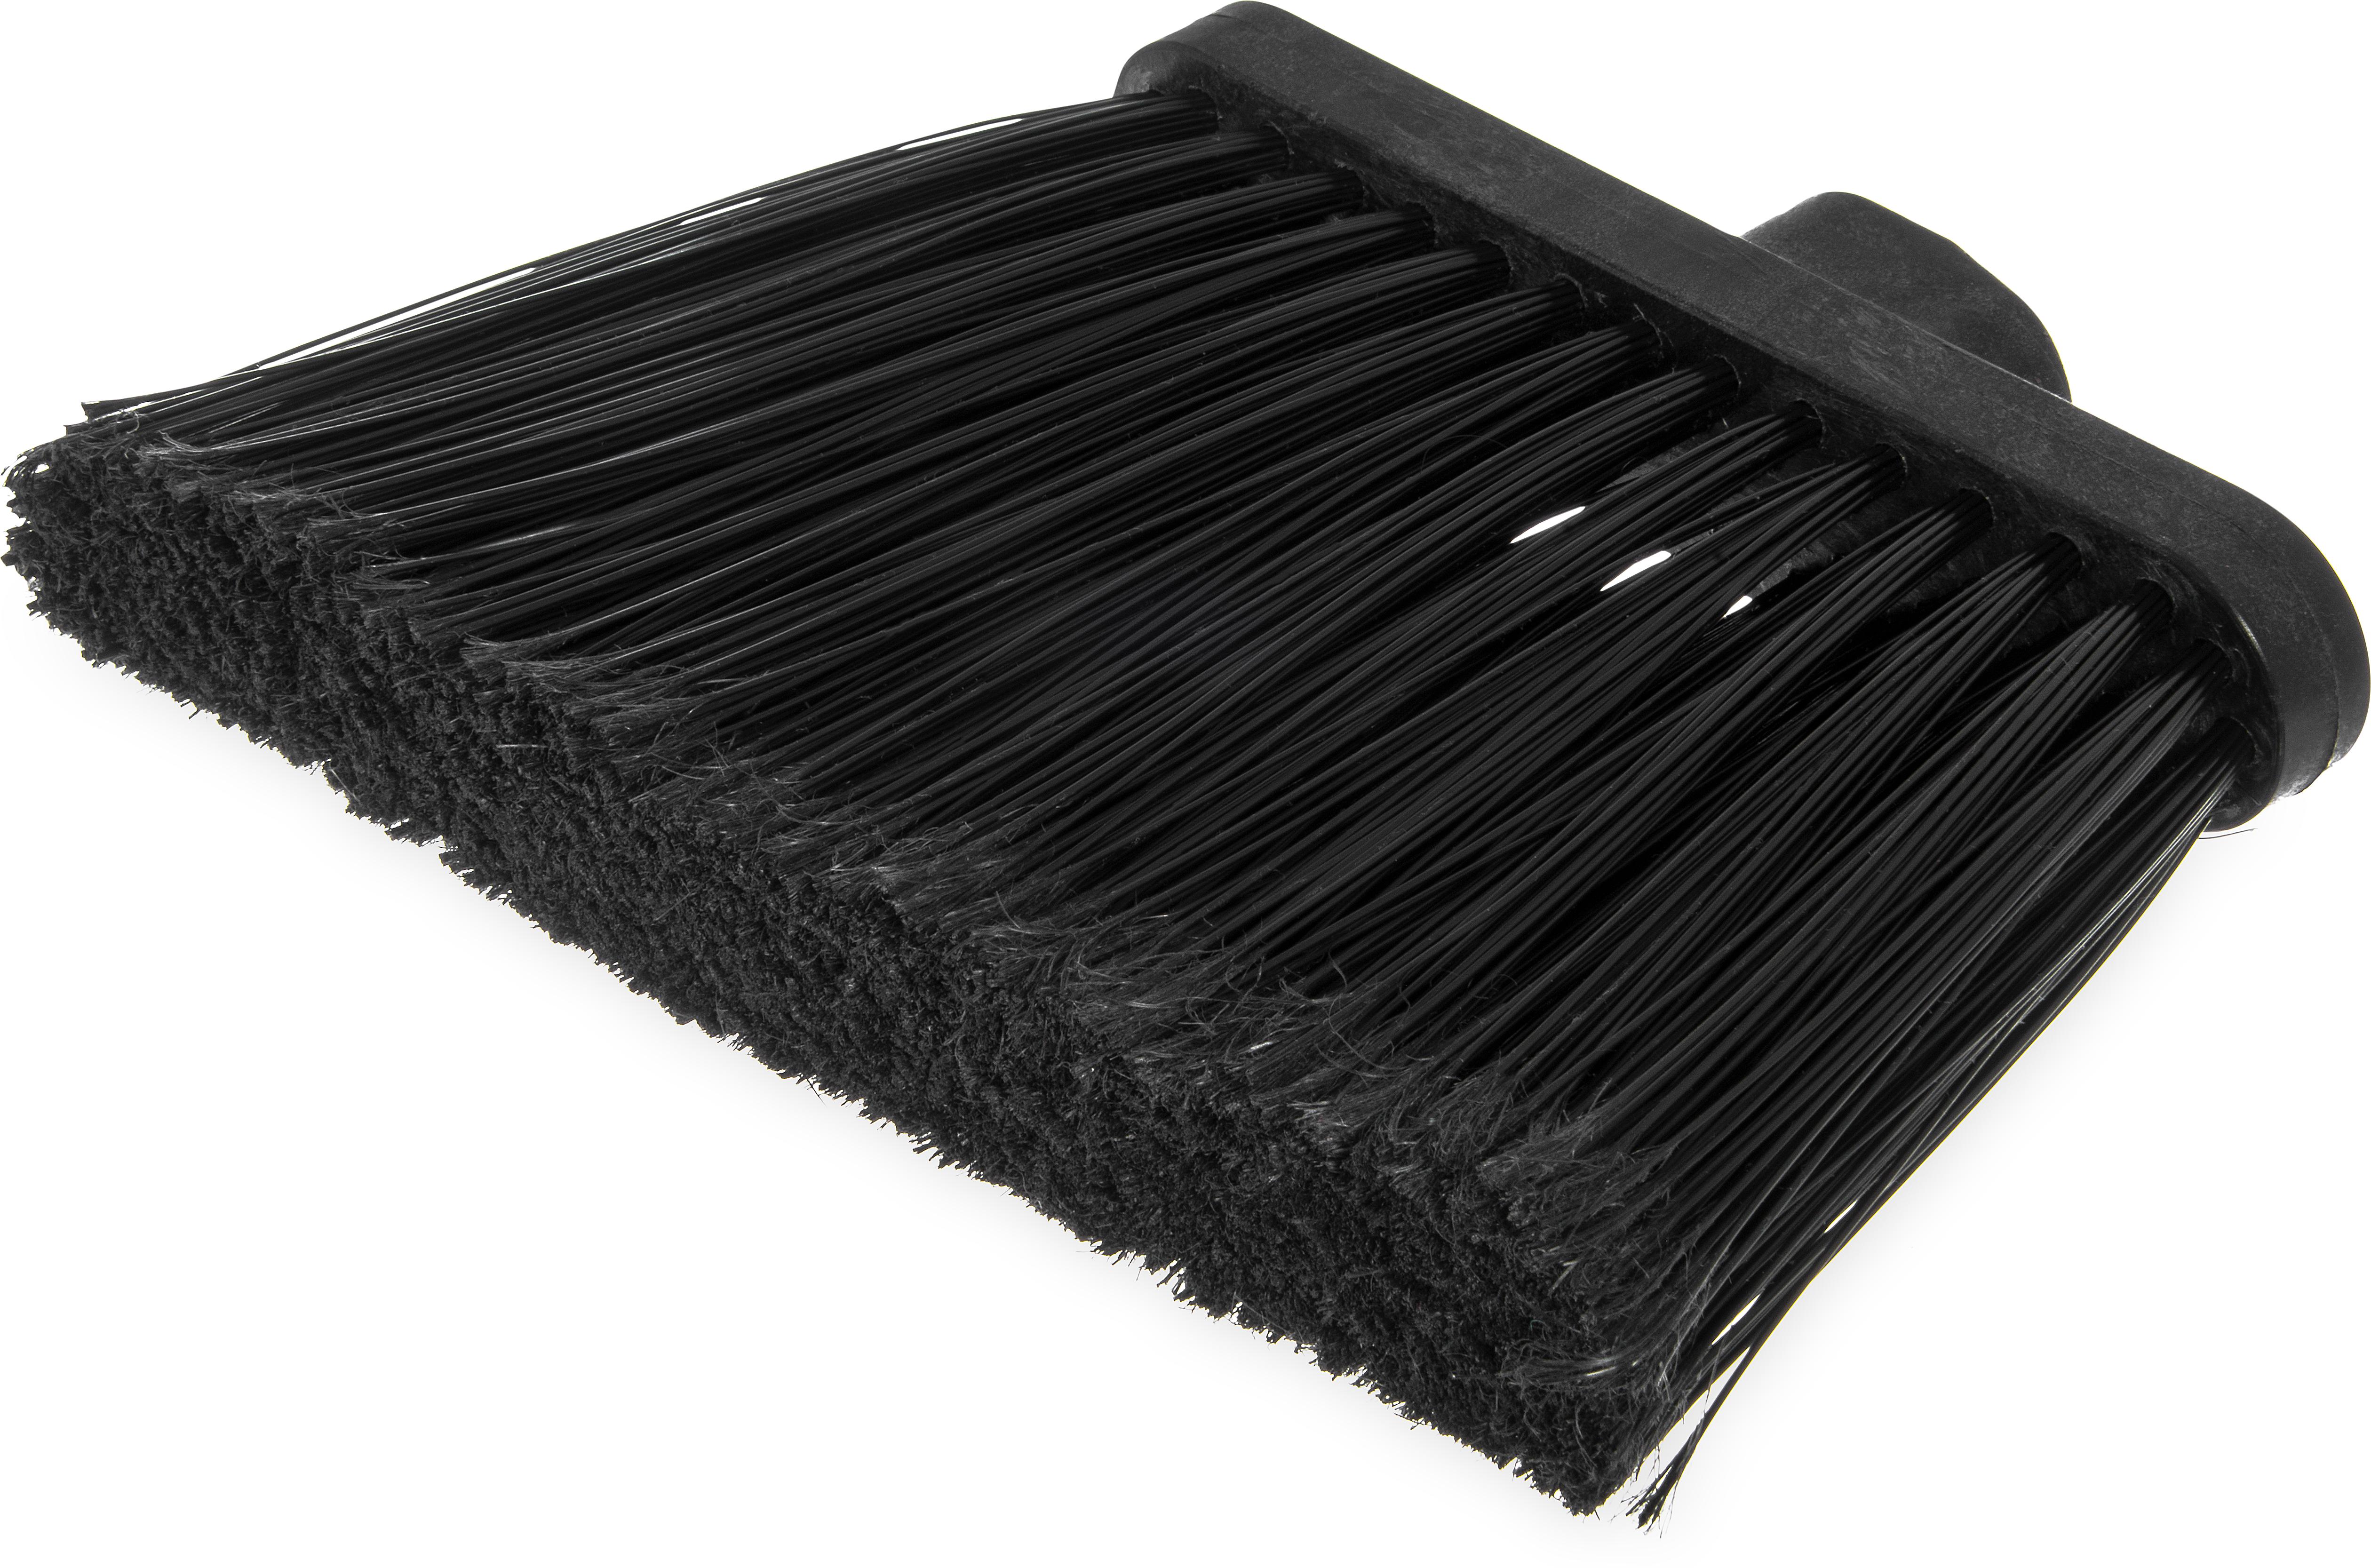 Carlisle 3686703 duo-sweep angle brooms